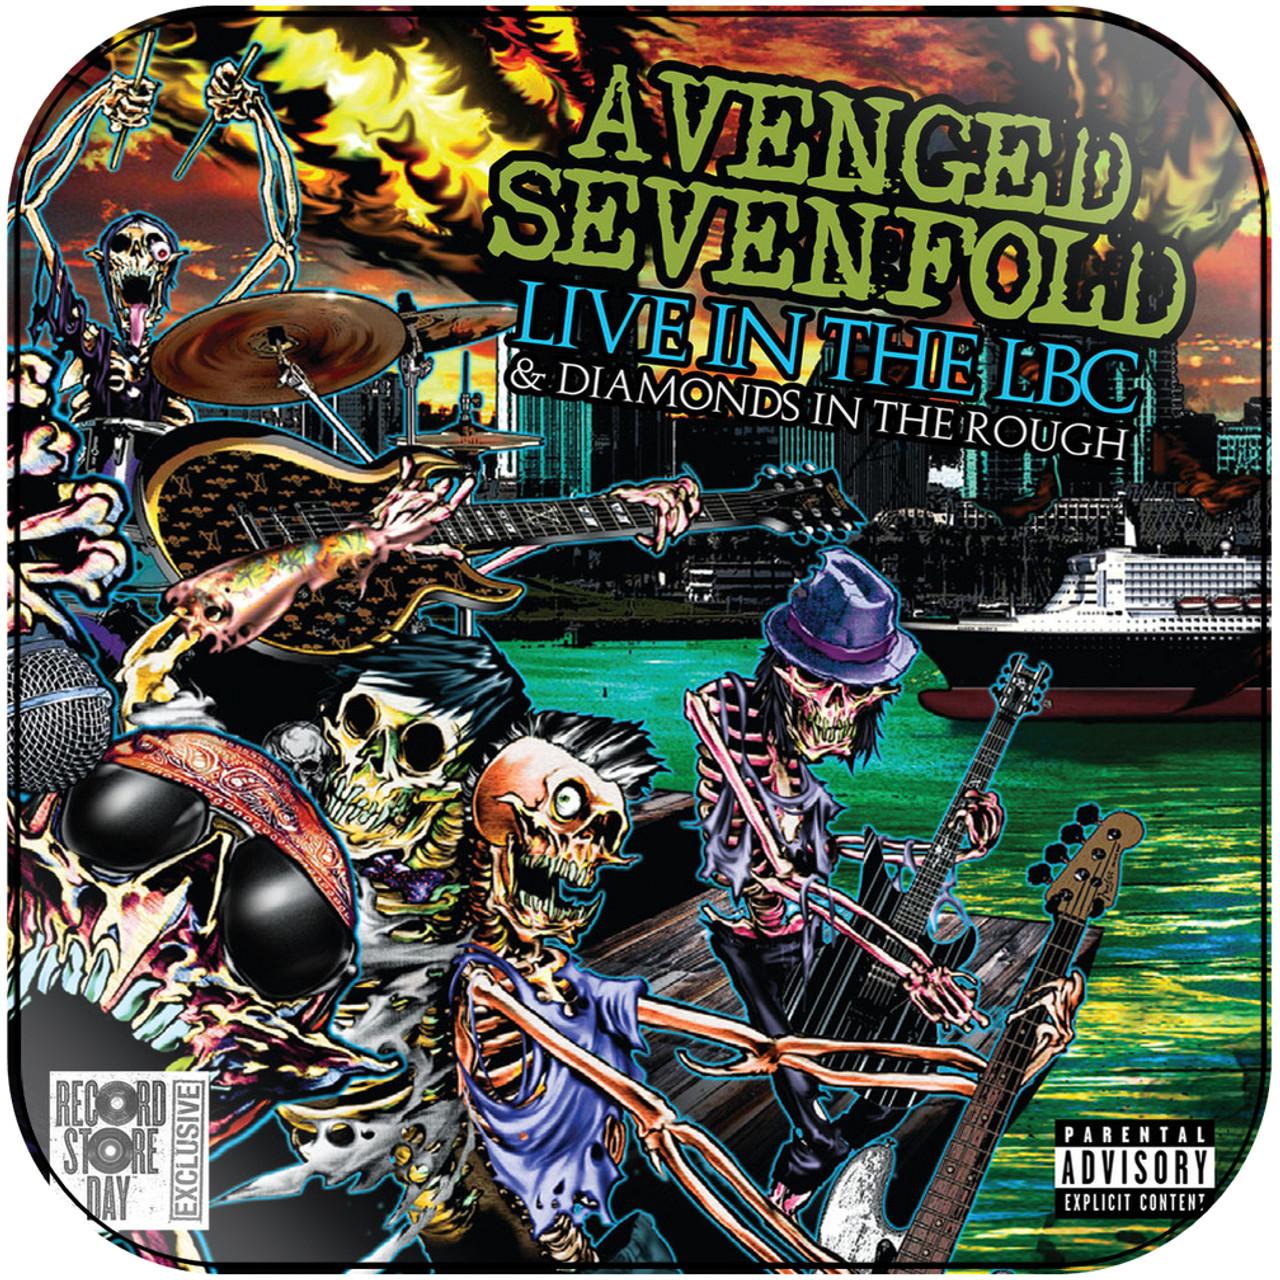 Avenged Sevenfold - Live In The Lbc Diamonds In The Rough-1 Album Cover  Sticker Album Cover Sticker